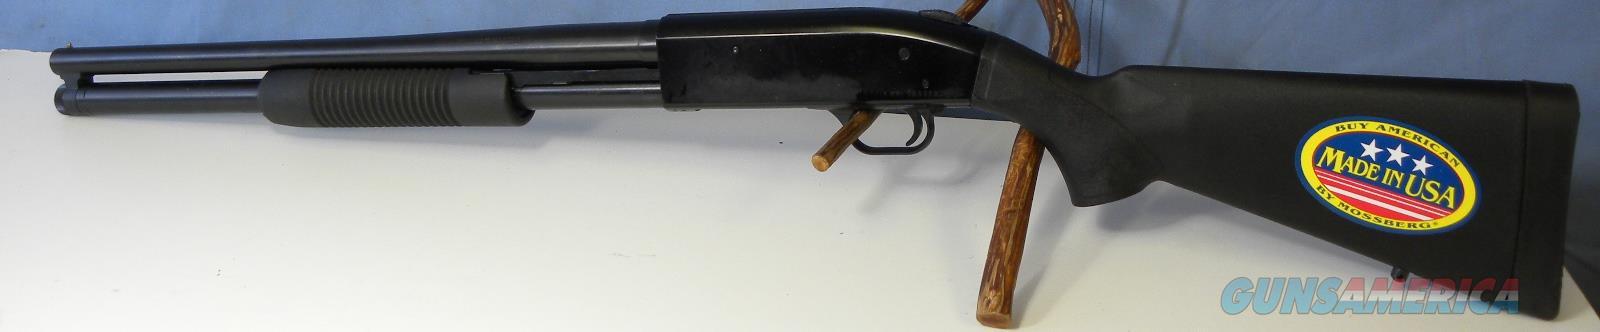 Mossberg 500 Persuader 50579  Guns > Shotguns > Mossberg Shotguns > Pump > Tactical